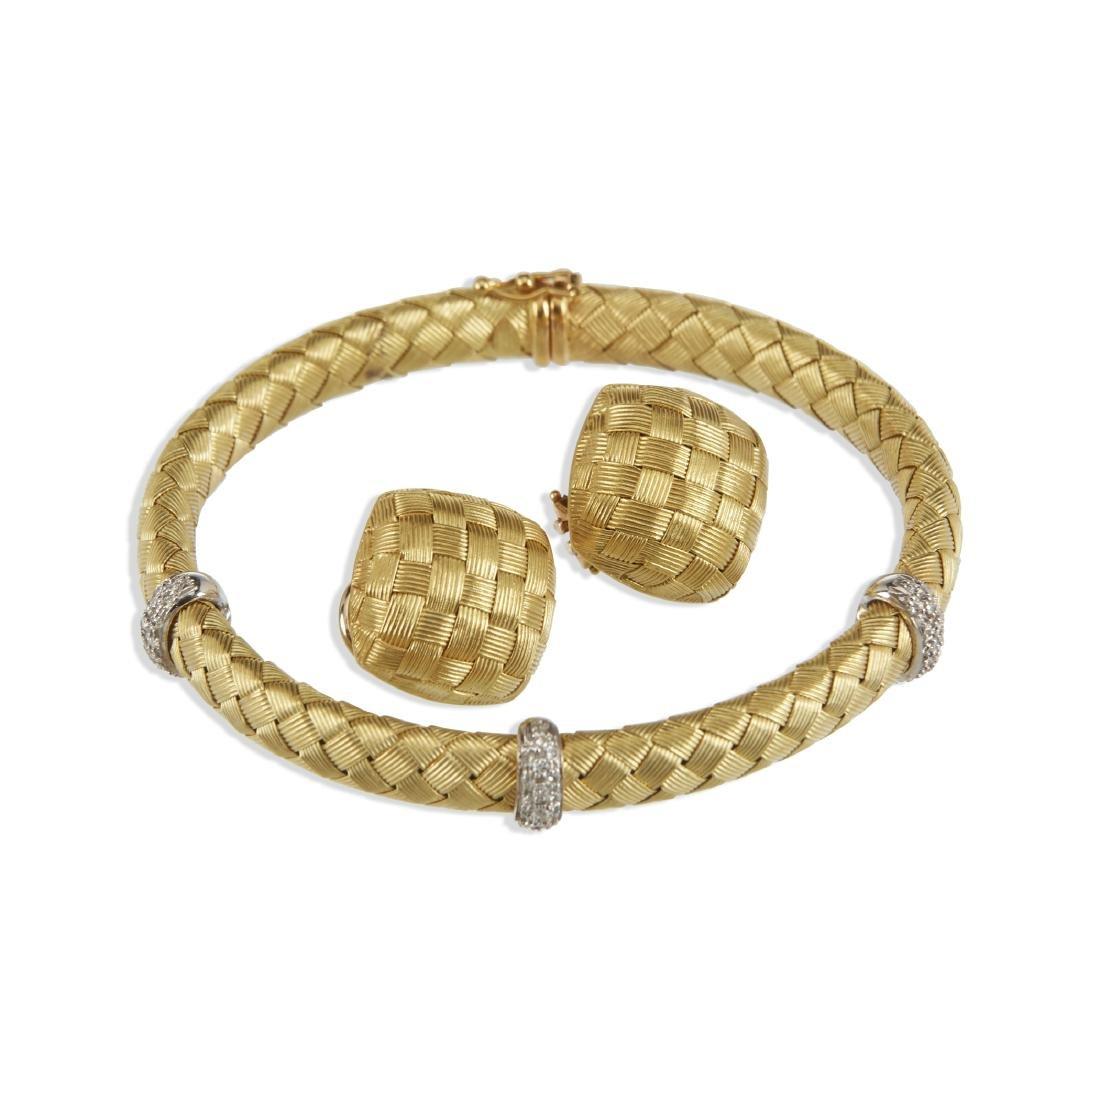 A Roberto Coin 18K Woven Bracelet & Earrings Set